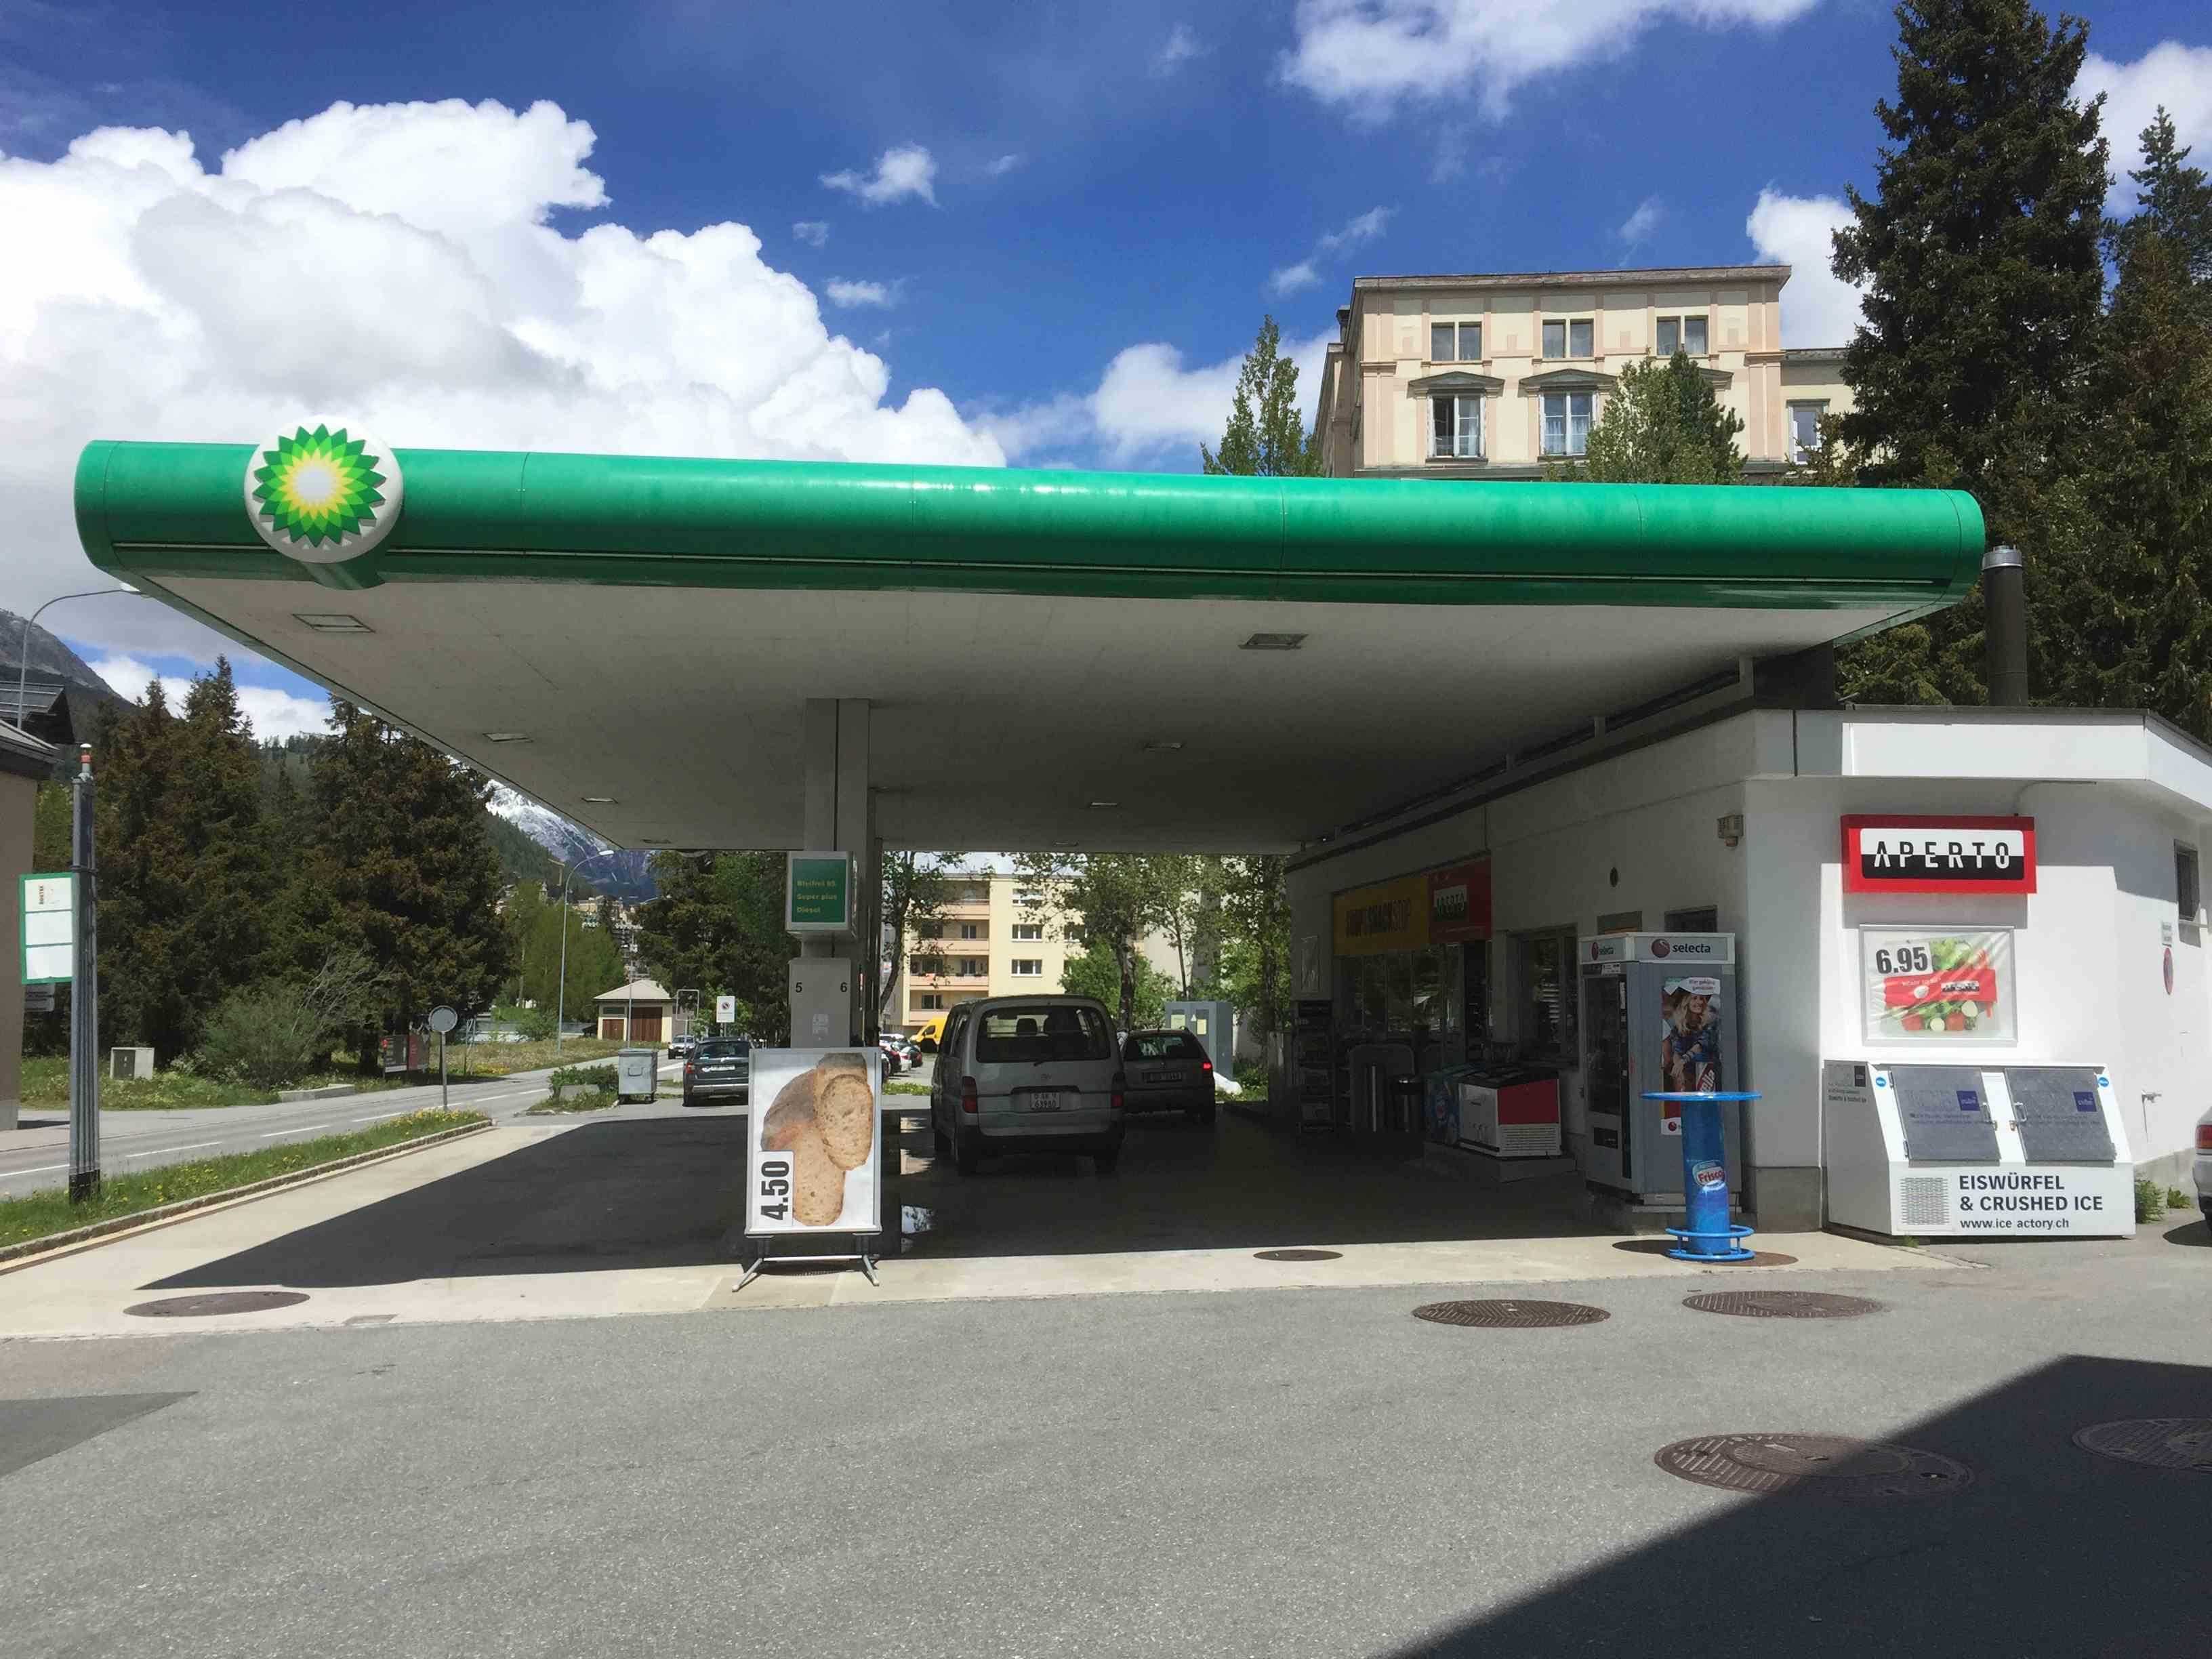 BP Tankstellen - Shop Slide 1